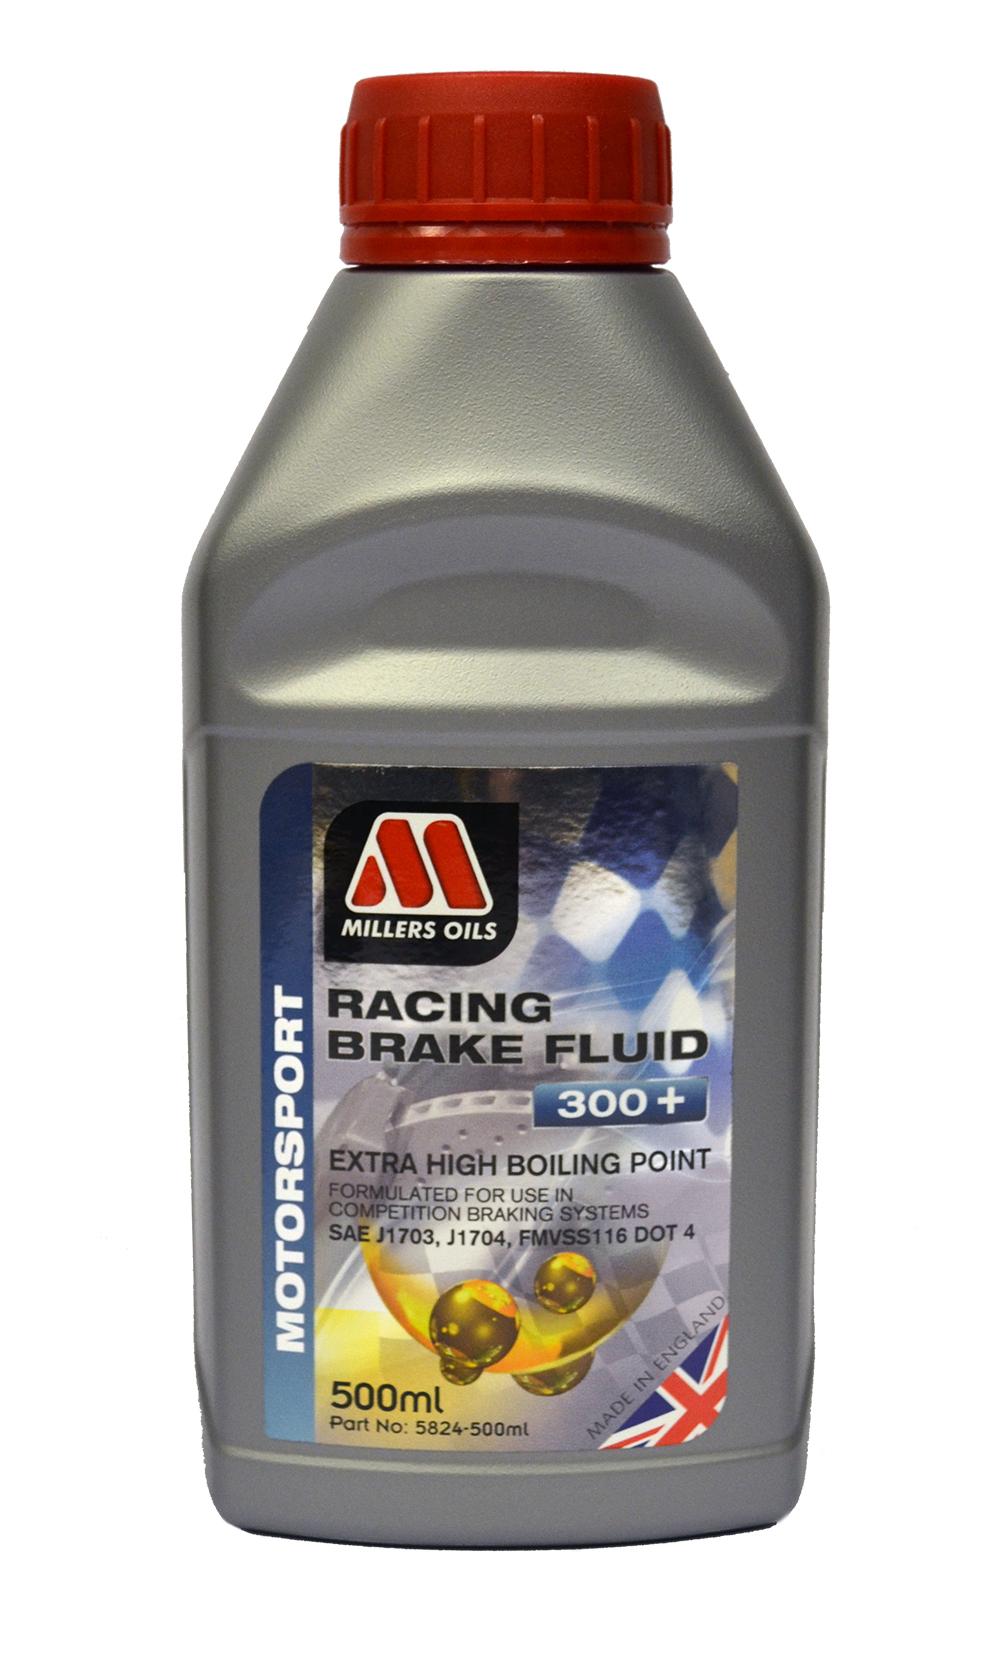 Racing Brake Fluid